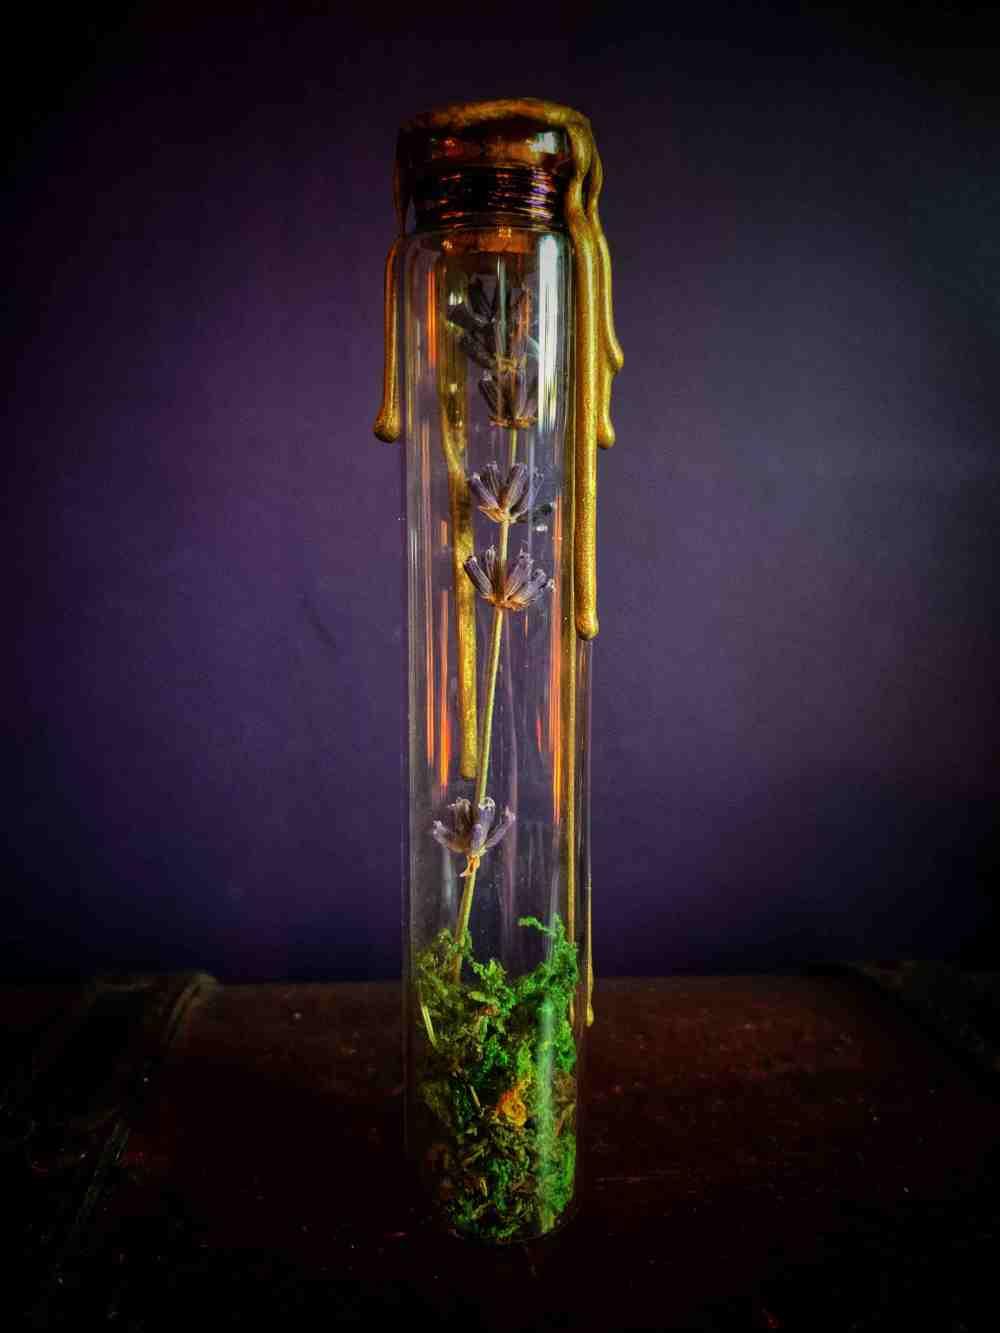 The Lavender Reliquary